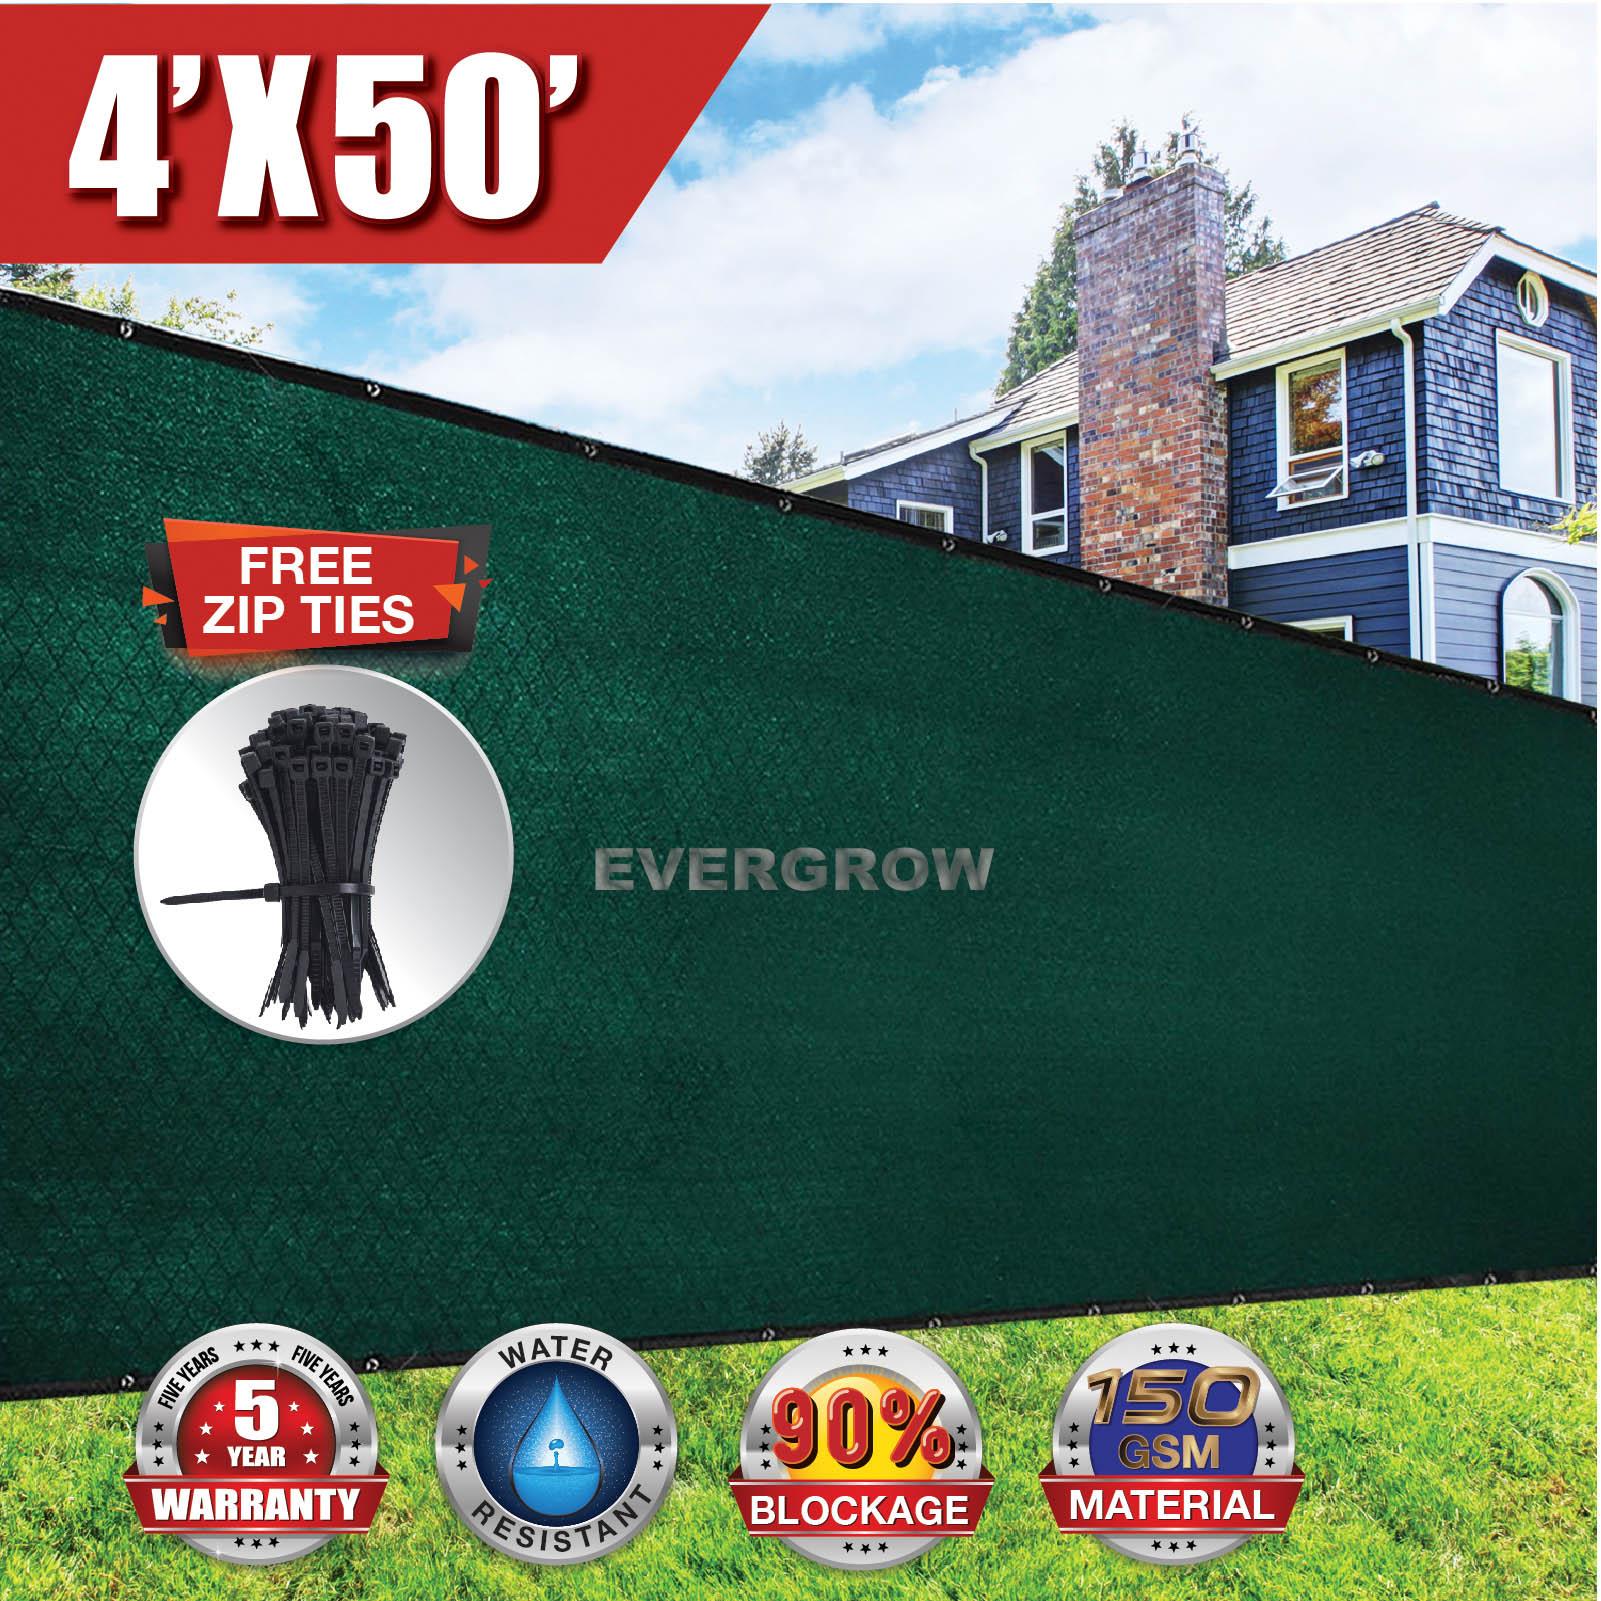 EVERGROW® 4' x 50' Dark Green Privacy fence screen 150 GSM Heavy Duty Windscreen Fence Shade Netting Cover Outdoor Patio 90% UV Blockage FREE Zip Ties 5 Years Warranty (G-FENCE-4X50-GREEN)